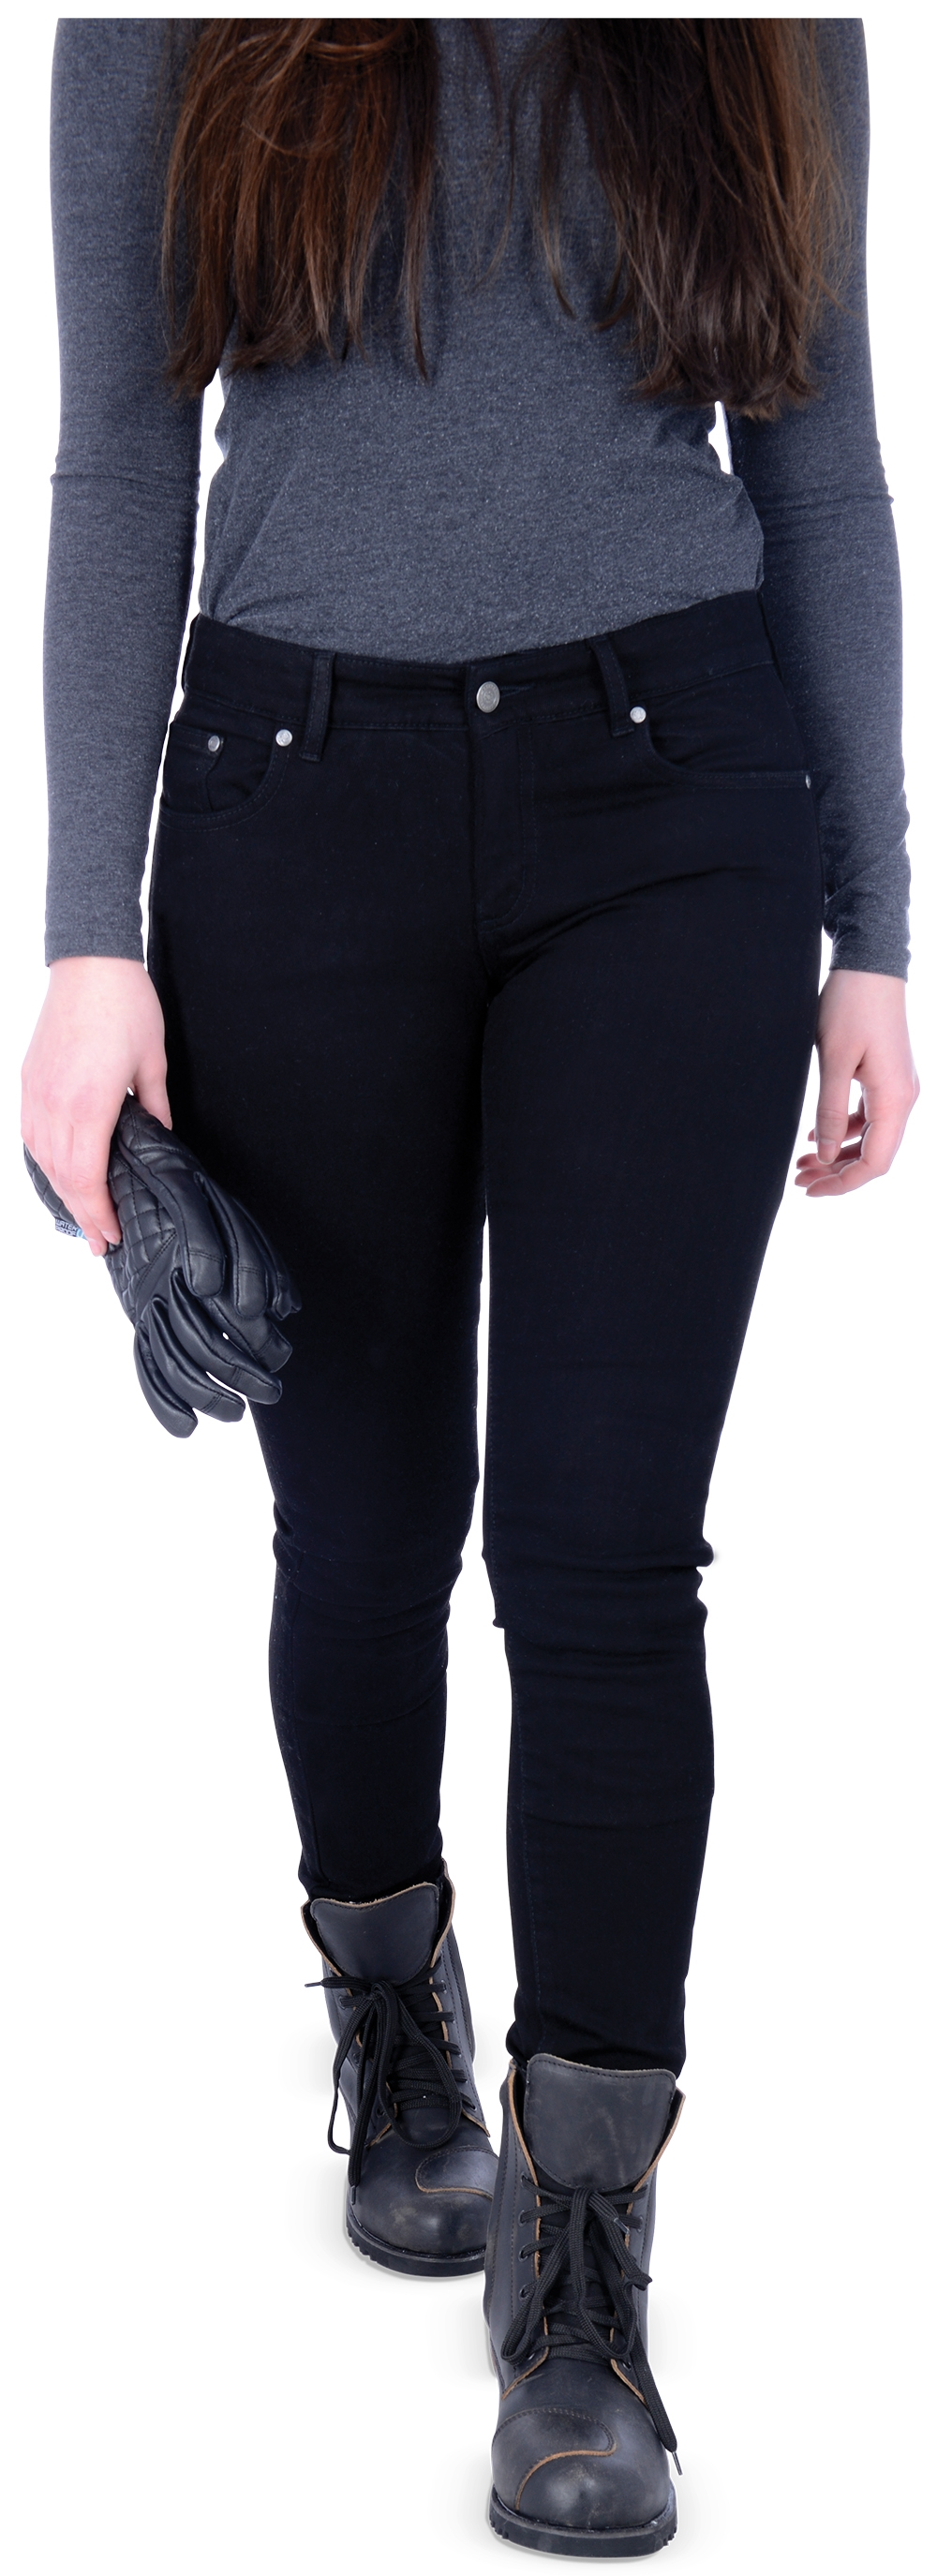 hinksey-womens-lifestyle Hinksey Jeans (Women's)